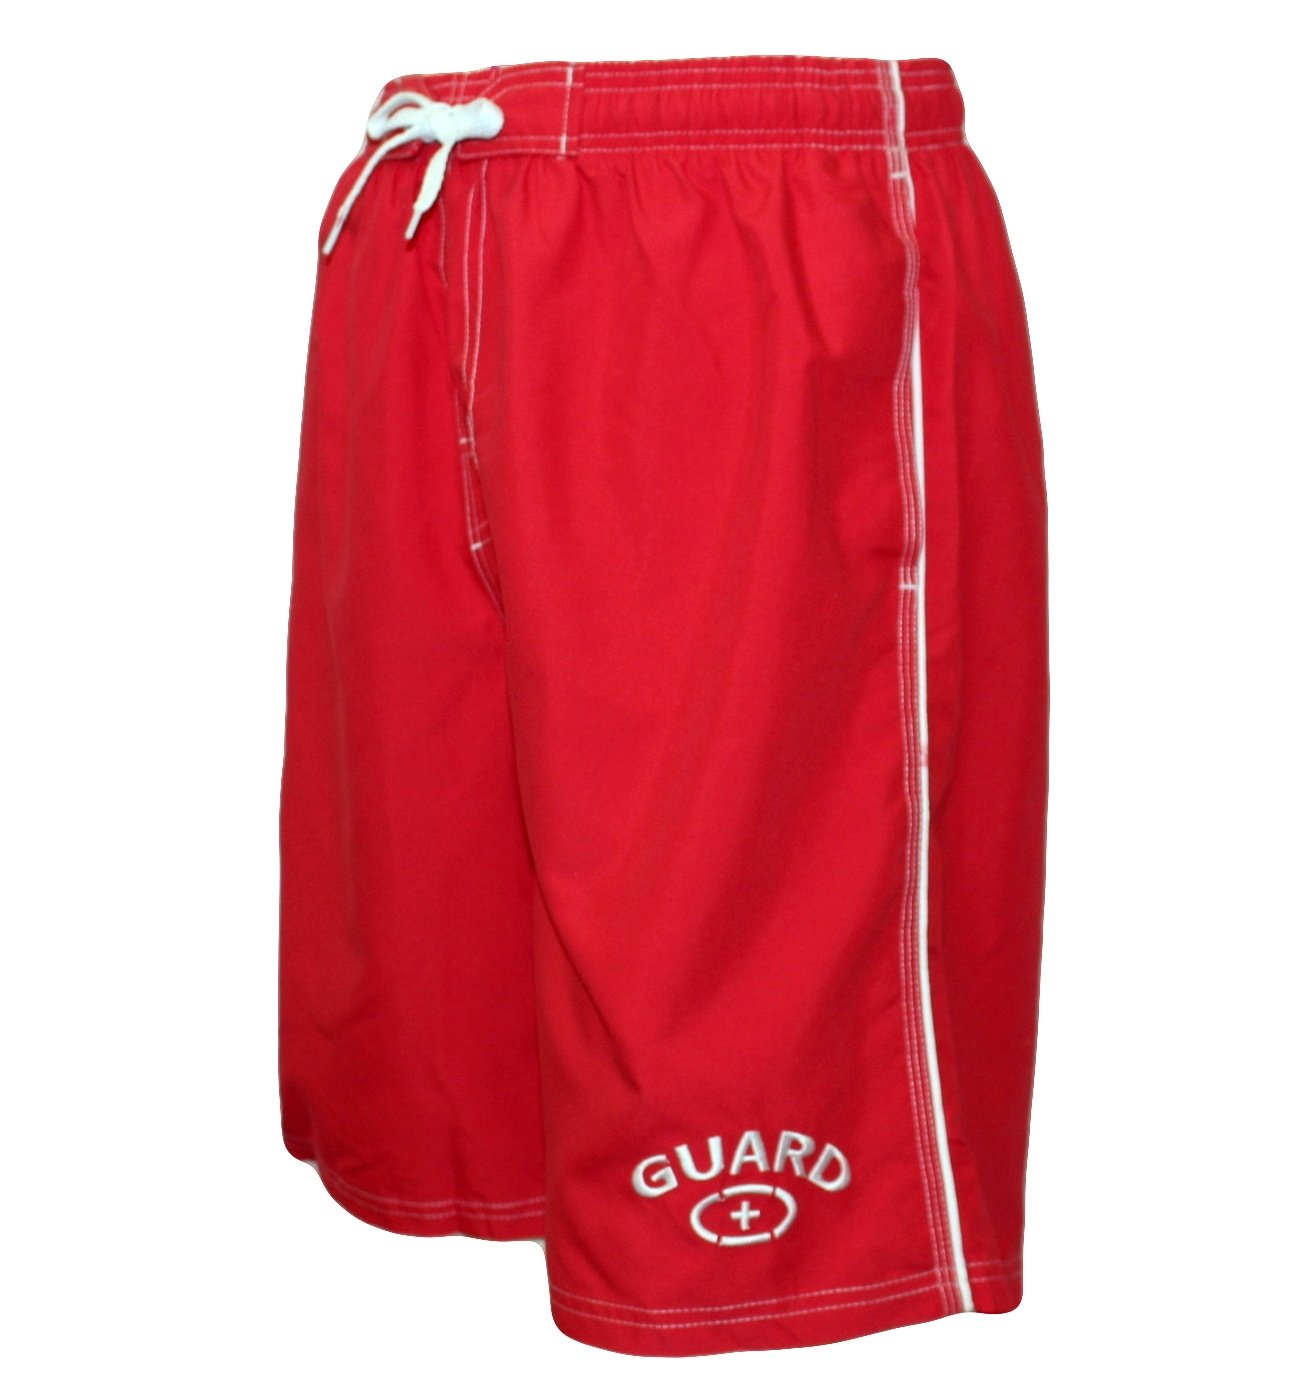 Adoretex Mens Guard Board Short Swimsuit